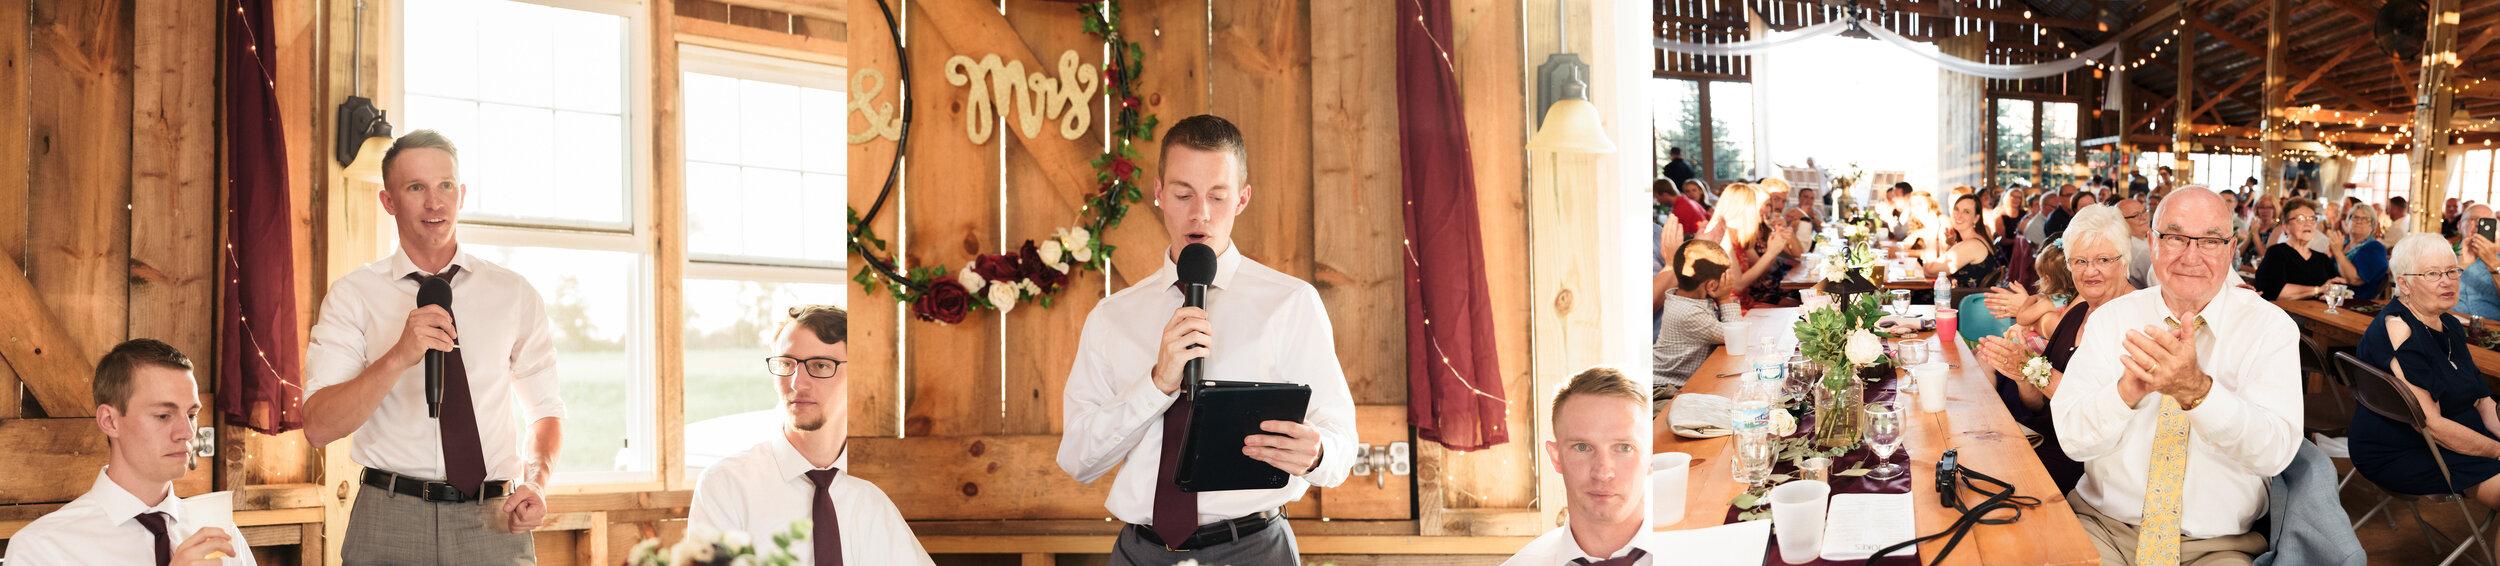 Speeches 02.jpg